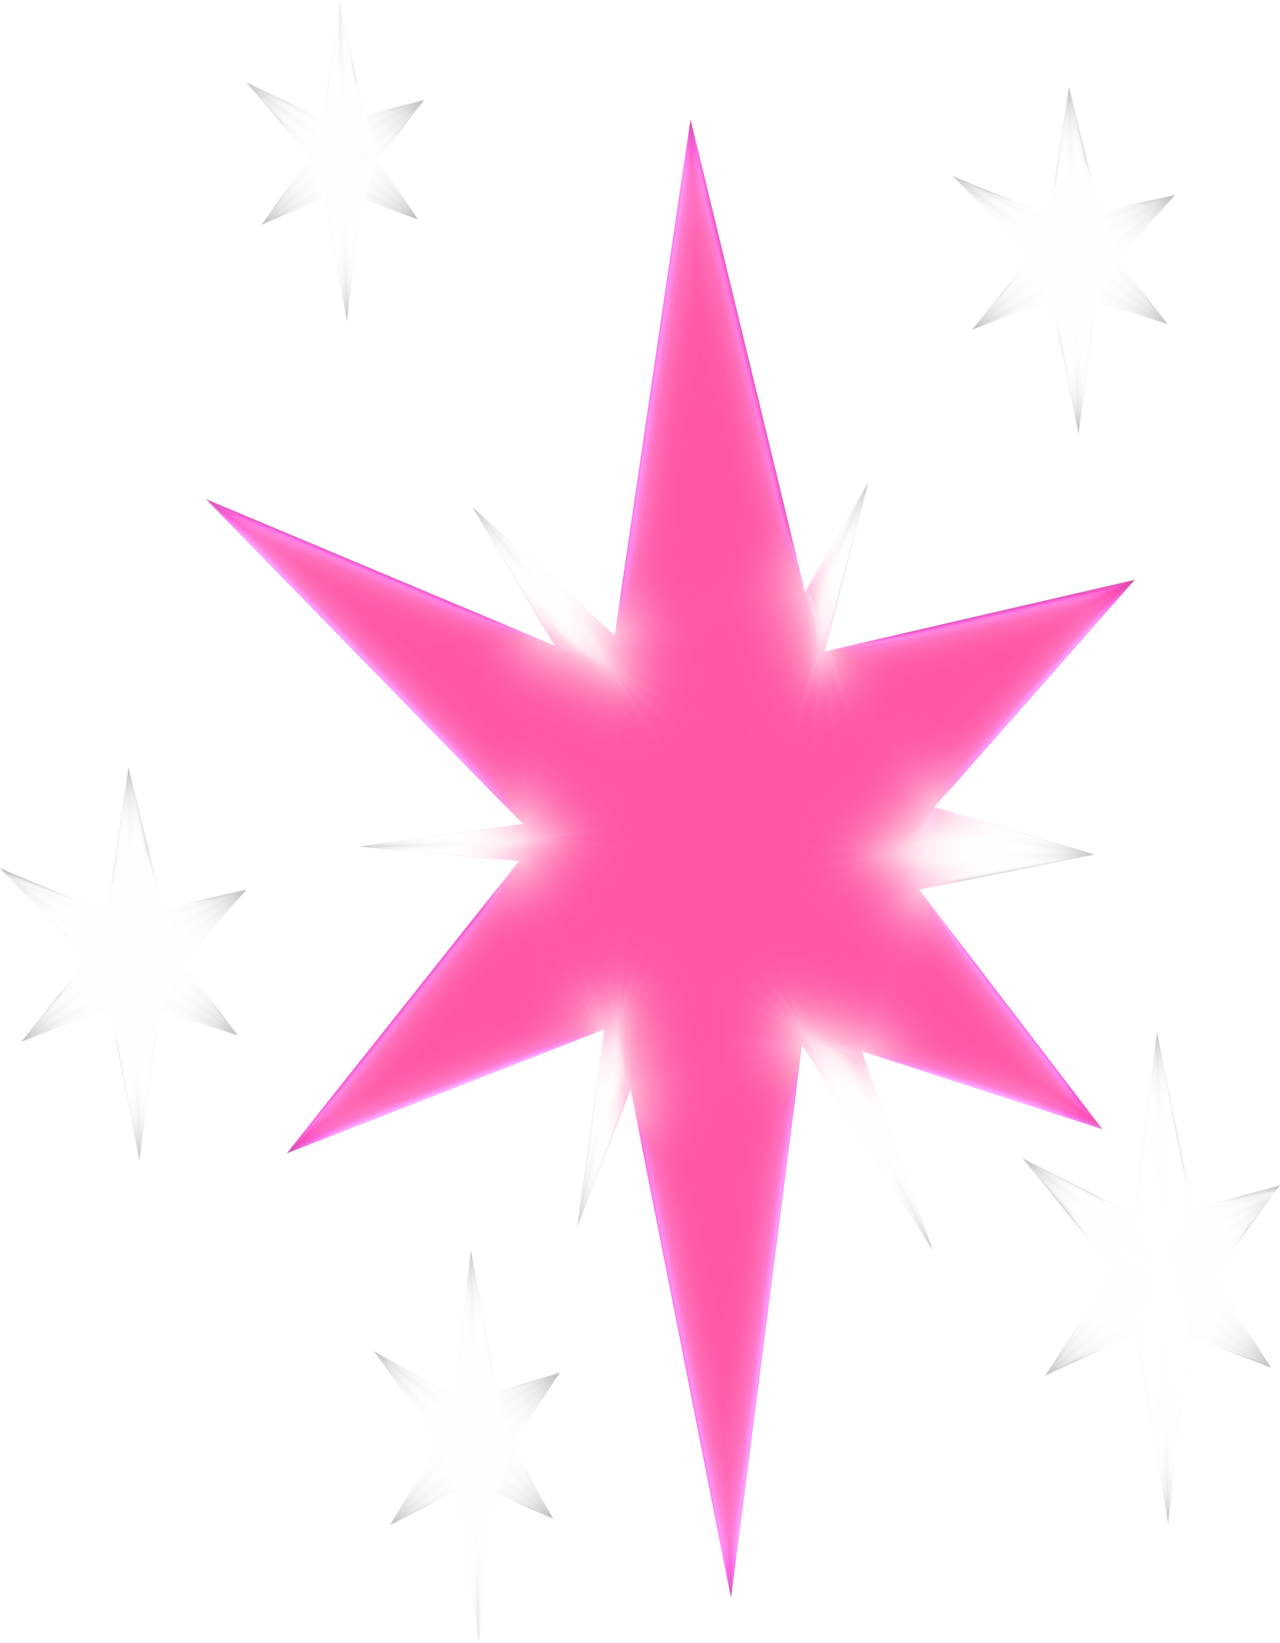 Neon Mlp Cutie Marks Zip Mlp Cutie Marks Twilight Sparkle Neon